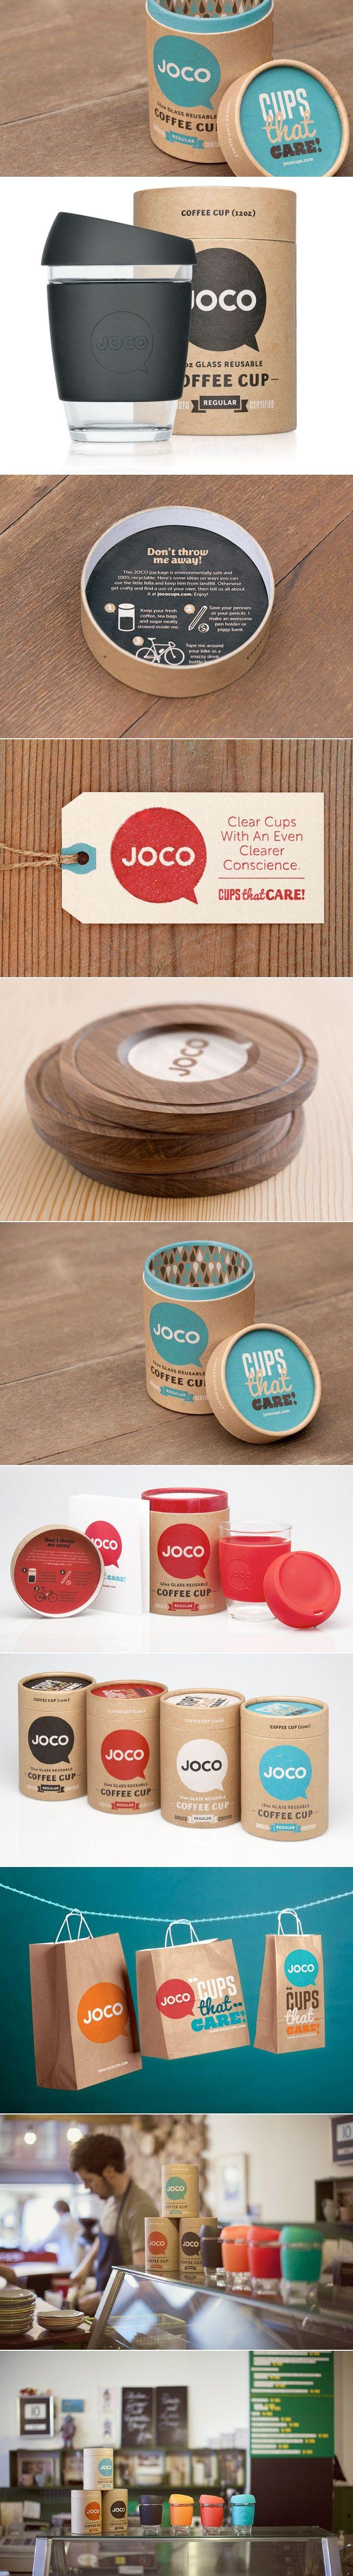 JOCO Coffee Cup — The Dieline | Packaging & Branding Design & Innovation News